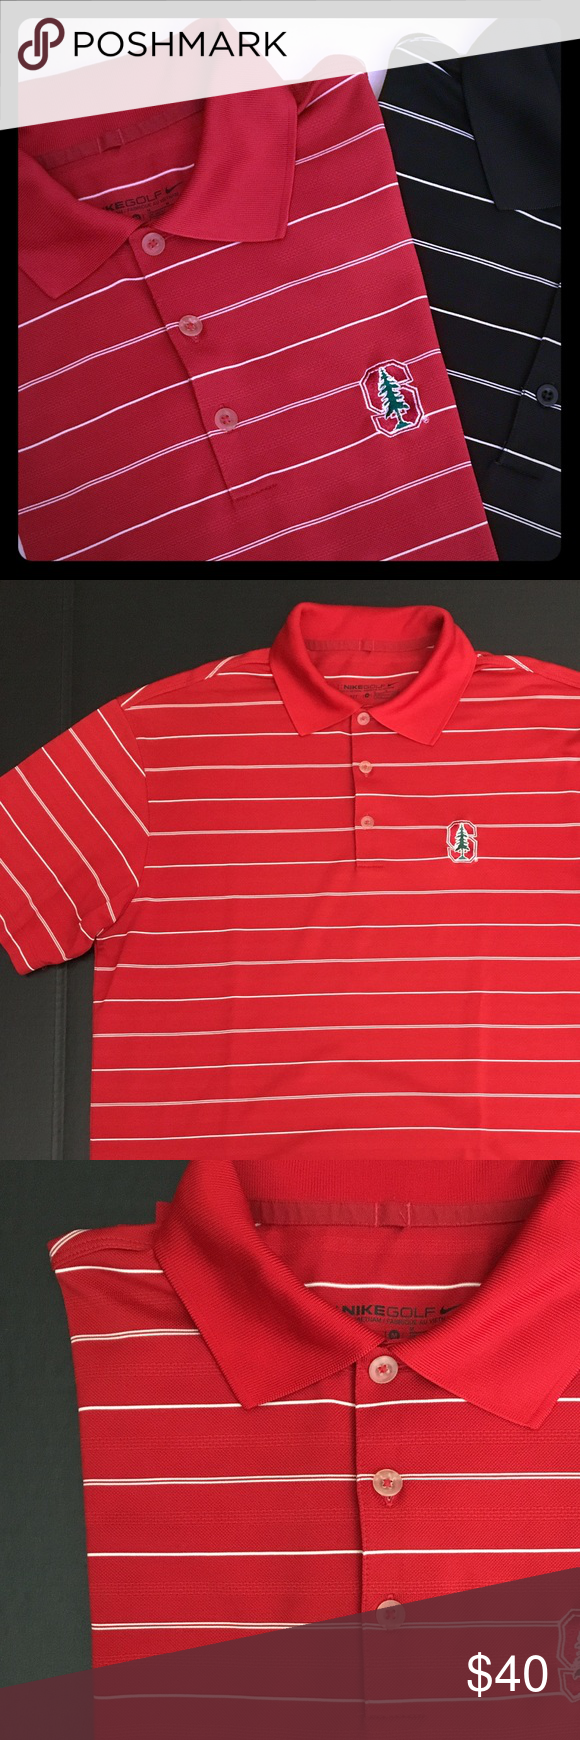 Set Stanford Nike Golf Plain Nike Polo Nike Golf Golf Polo